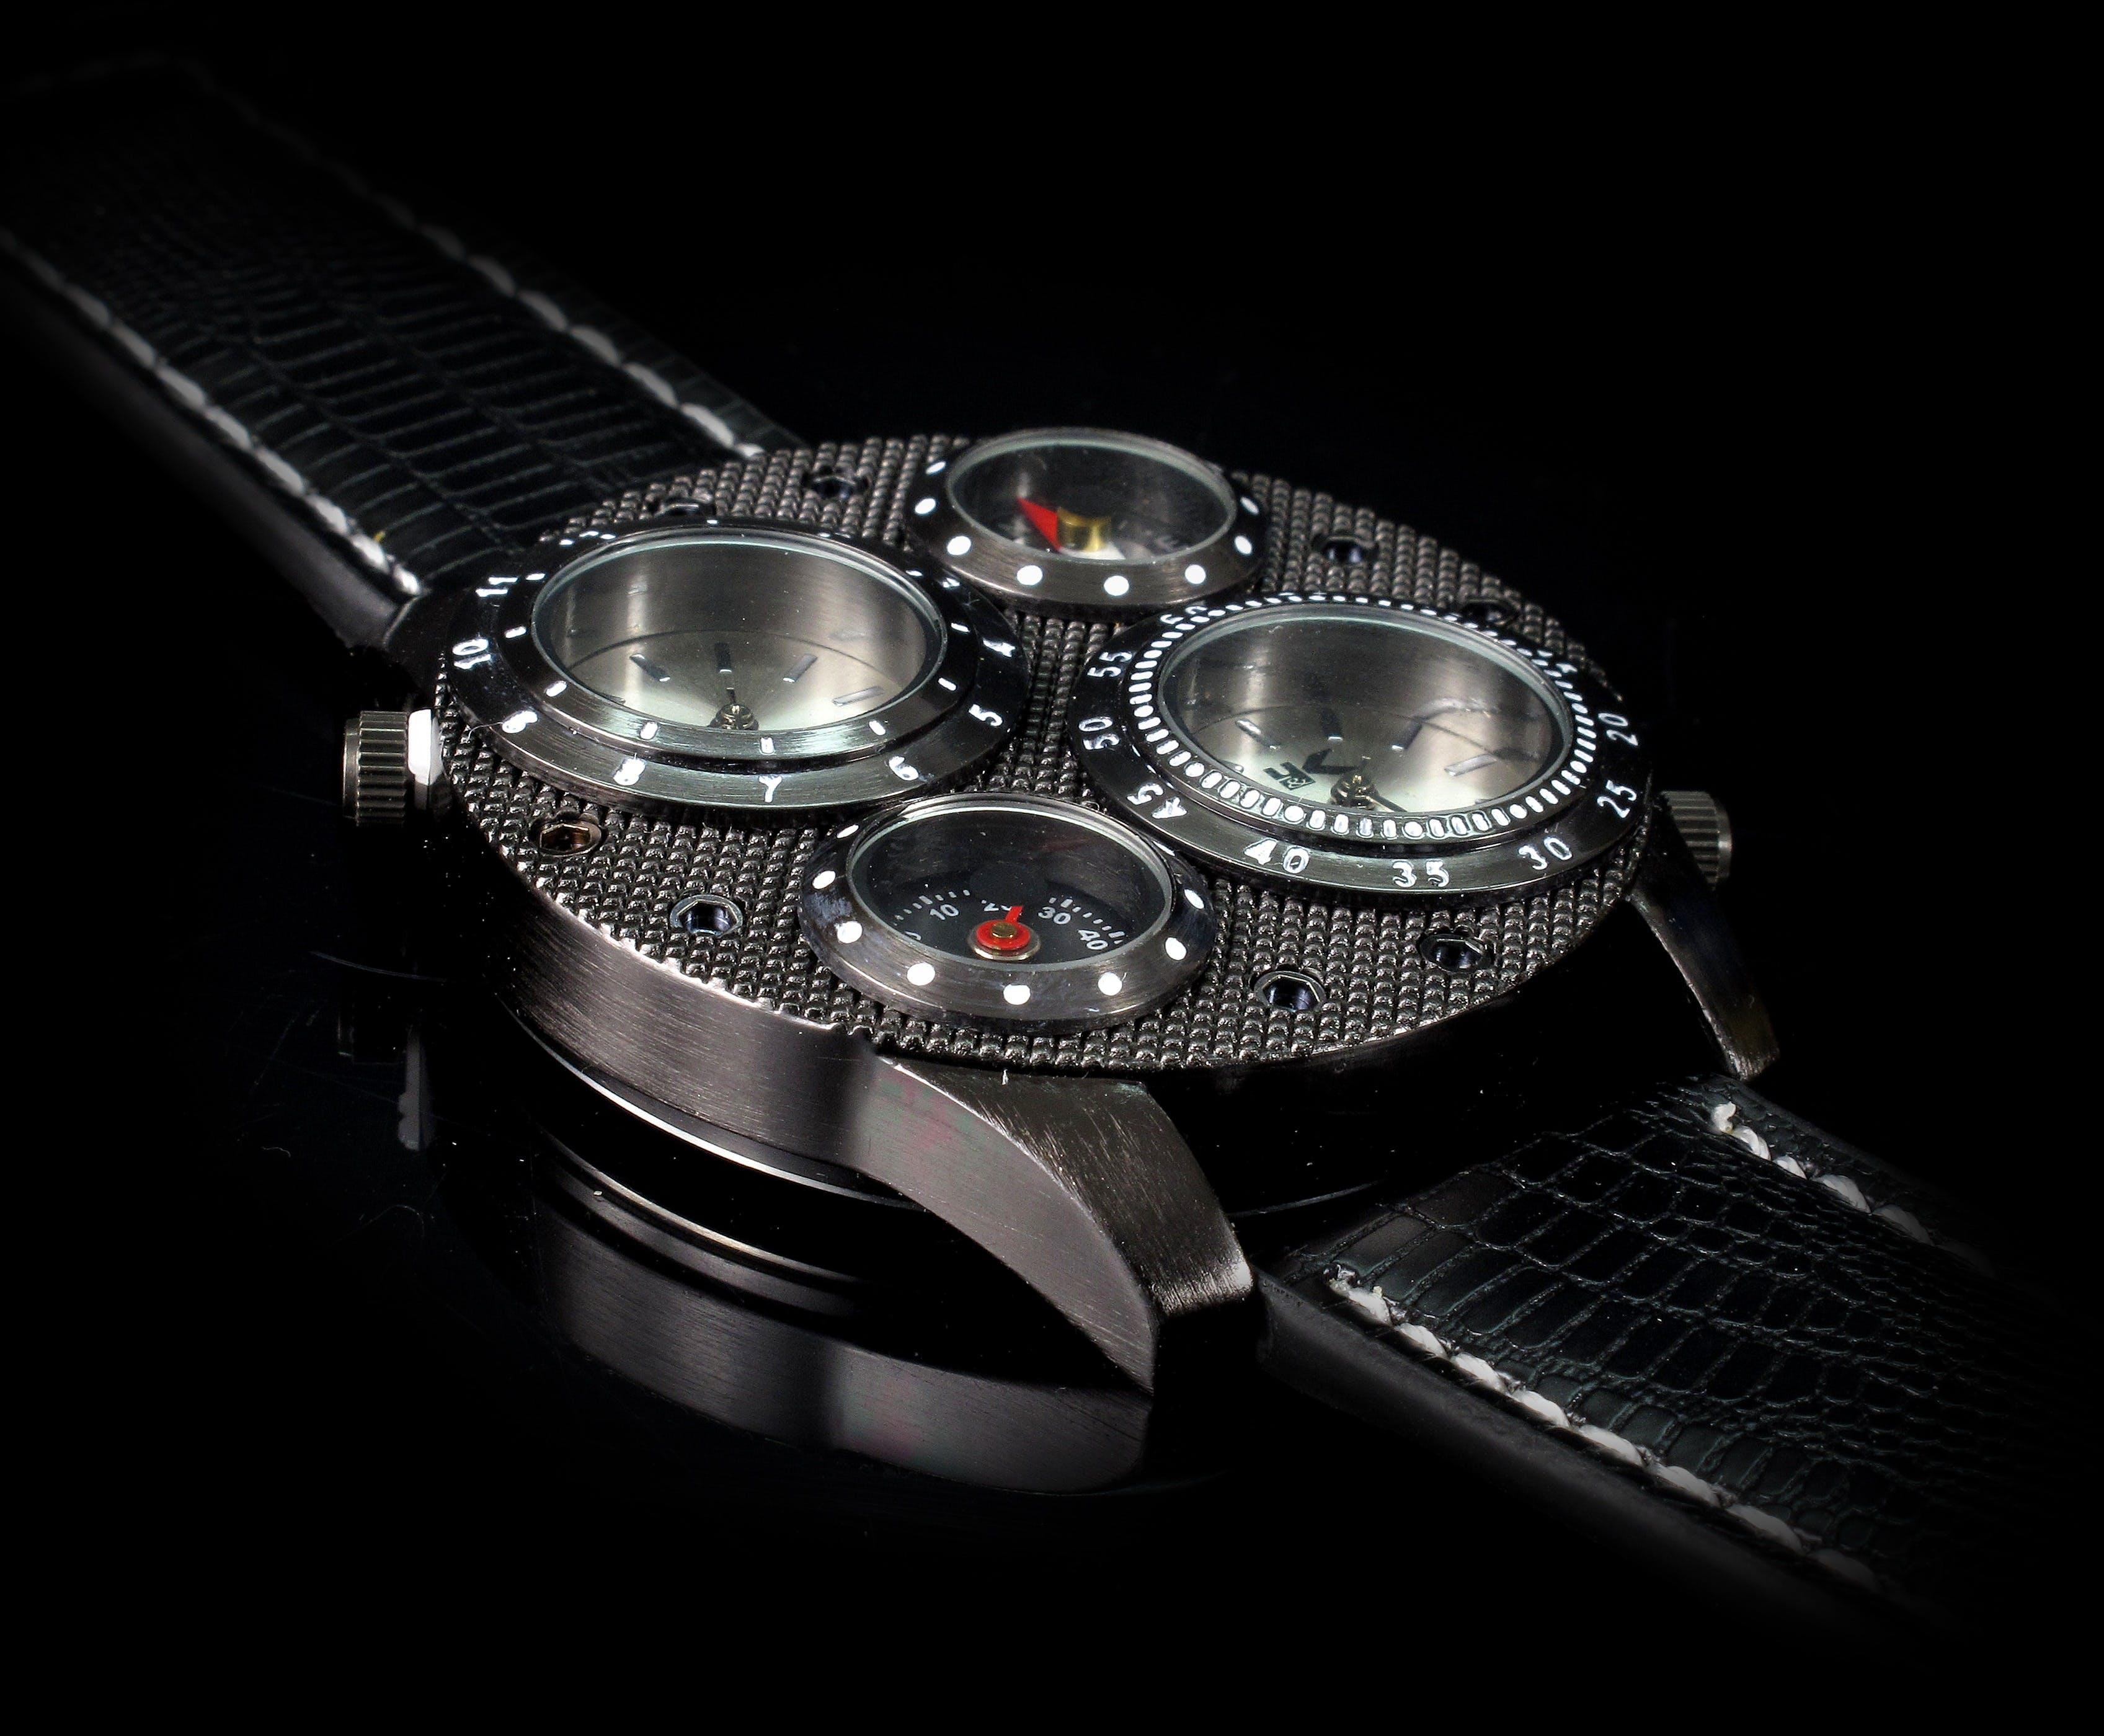 Безкоштовне стокове фото на тему «аксесуар, великий план, наручний годинник, час»